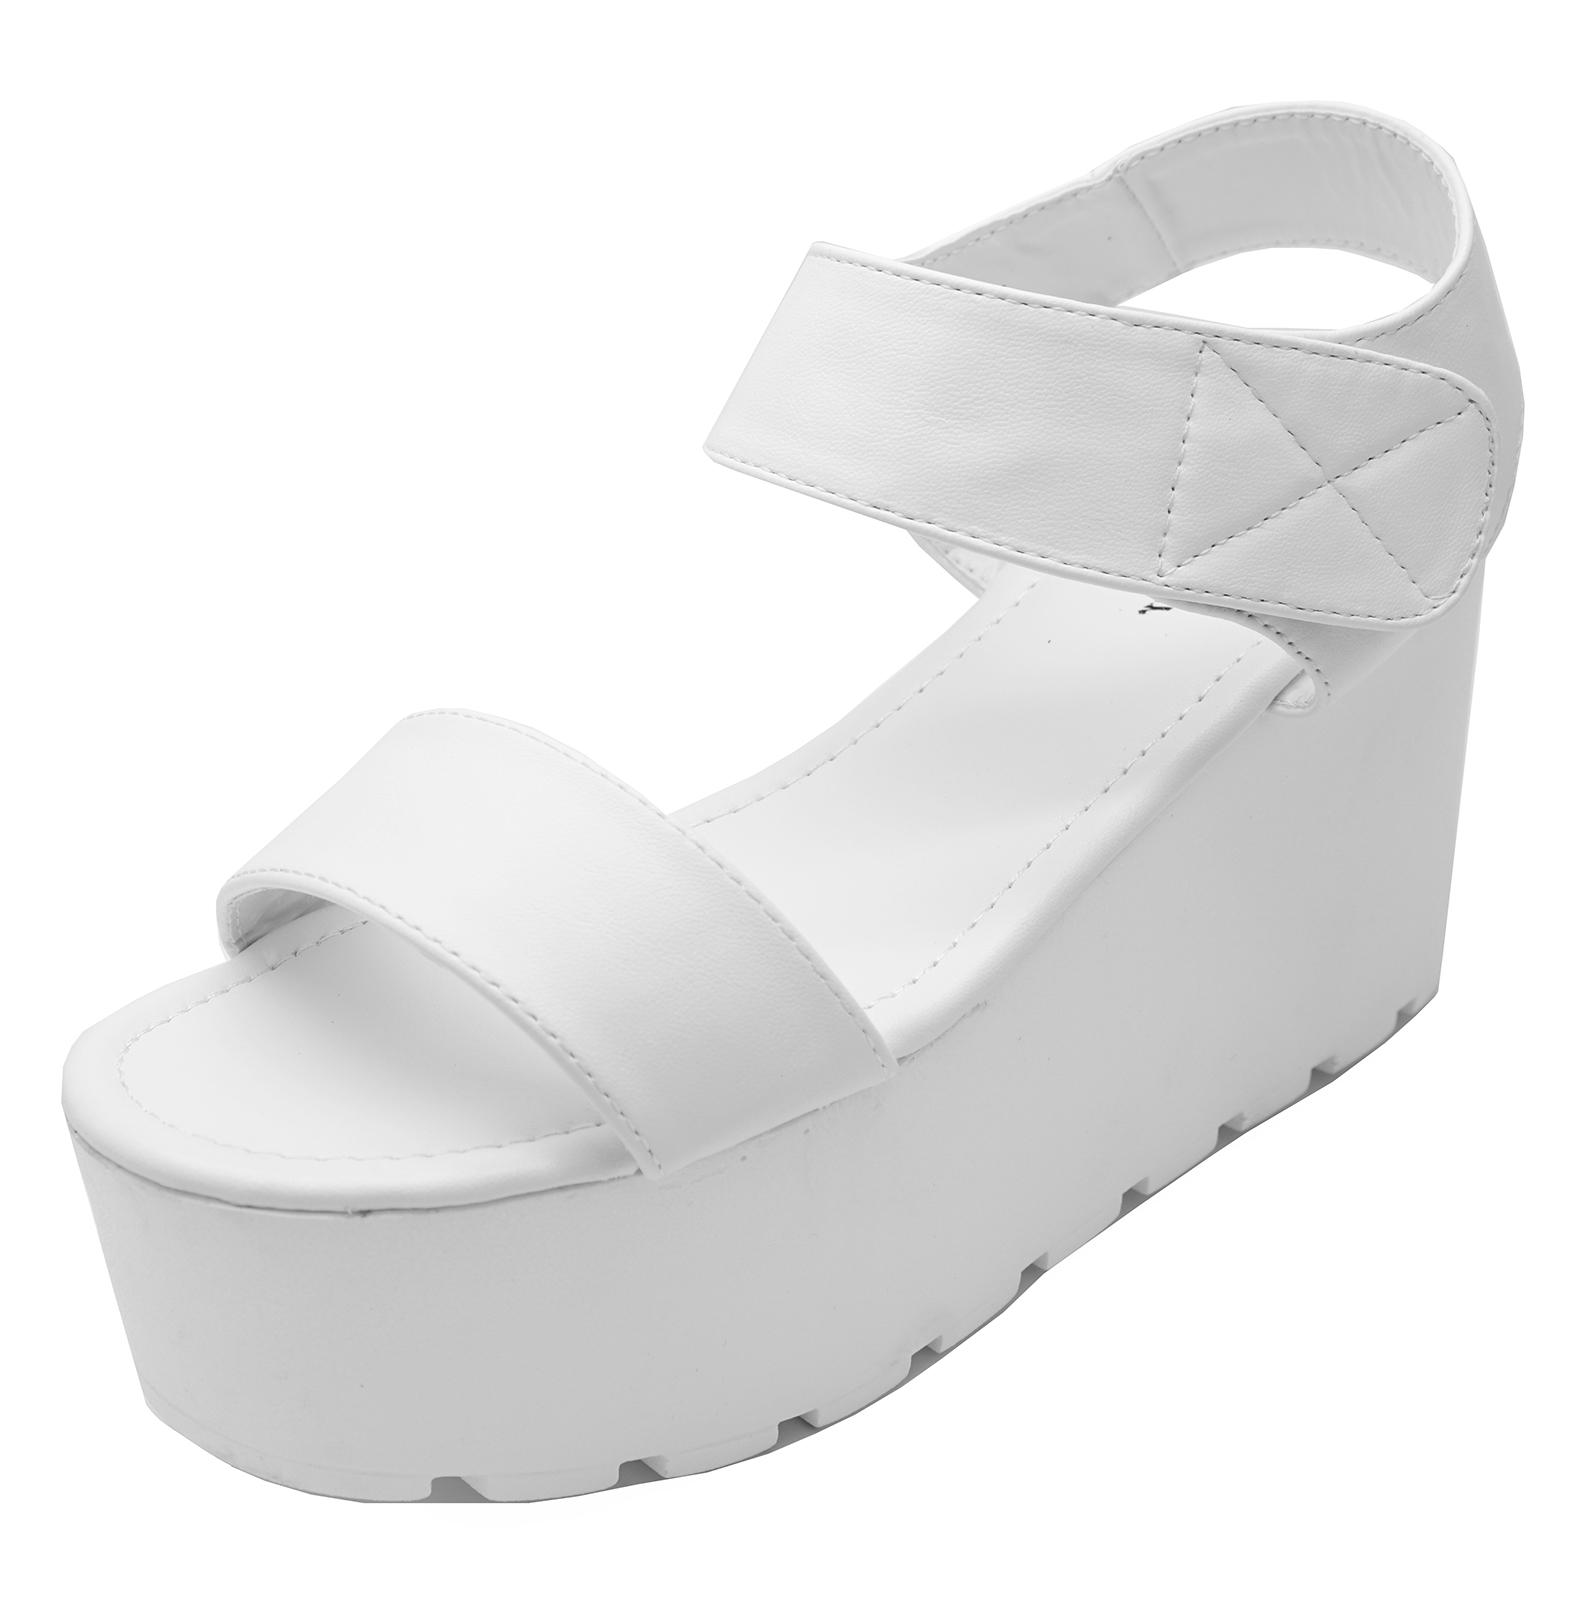 02e98f346d62 LADIES WHITE PEEP-TOE PLATFORM WEDGE SANDALS COMFY WALKING SHOES ...